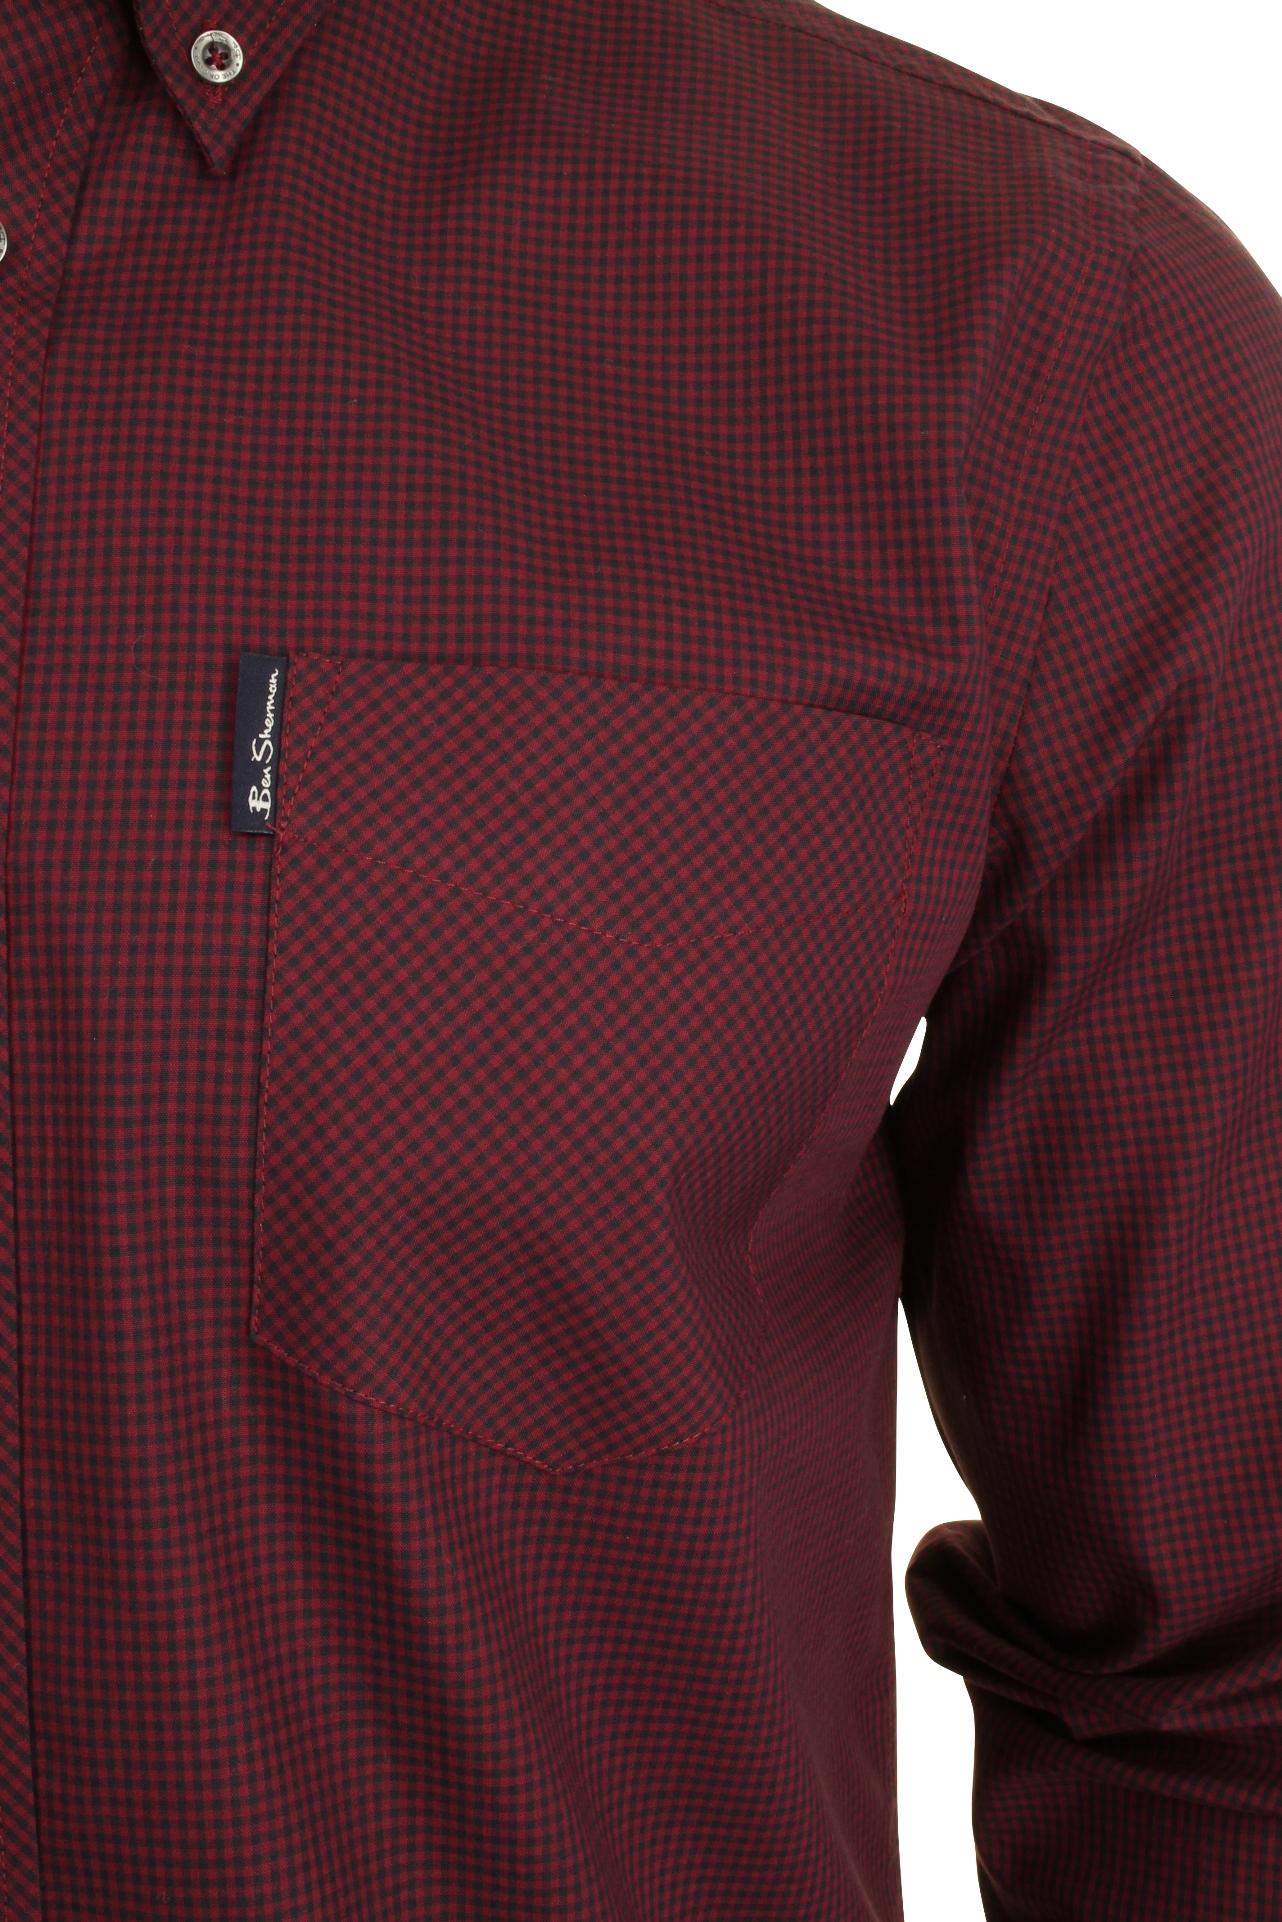 Mens-Classic-Gingham-Shirt-by-Ben-Sherman-Long-Sleeved thumbnail 10